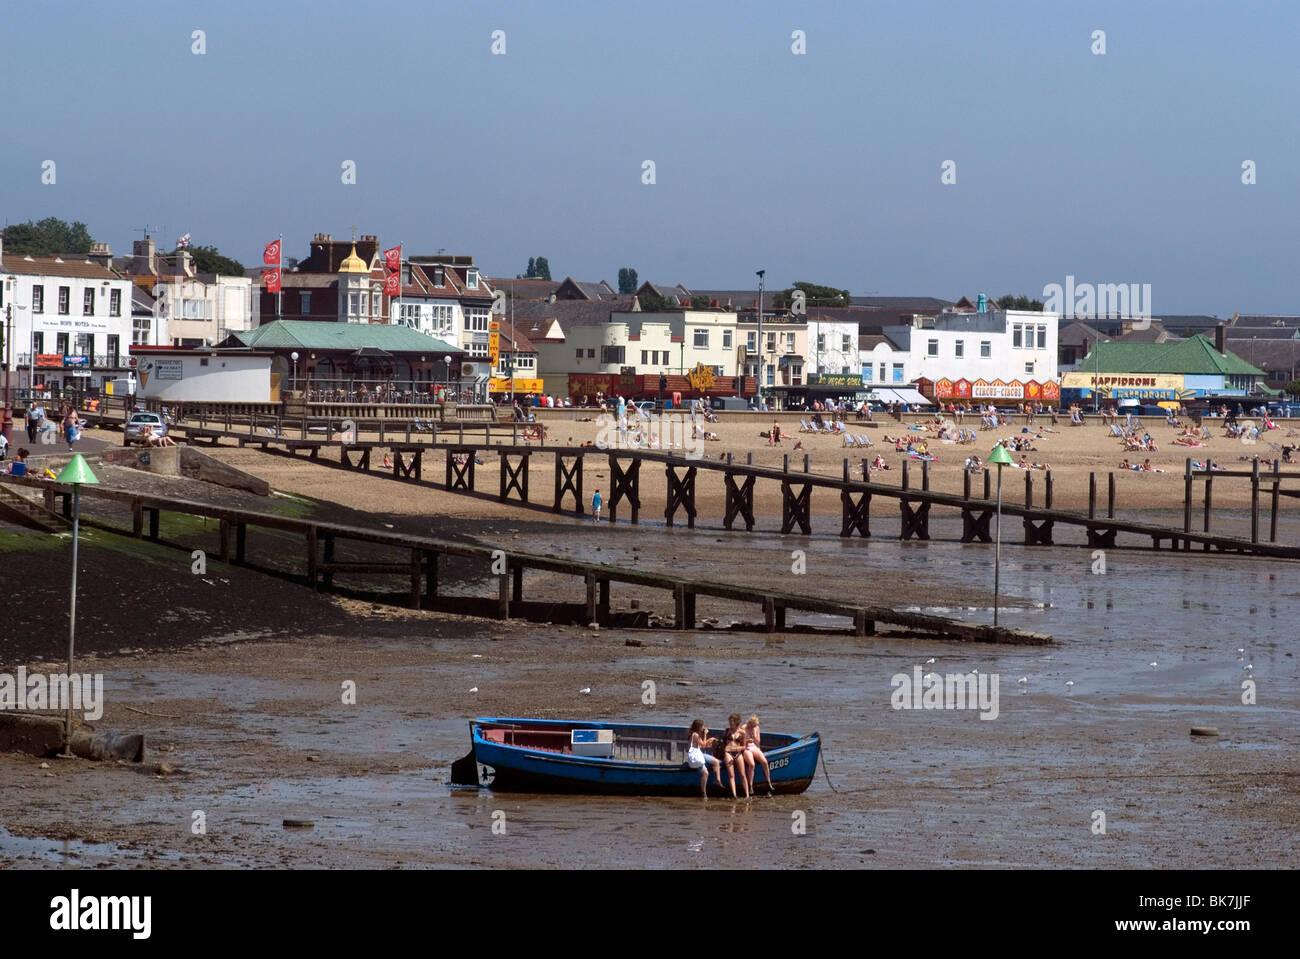 Southend Beach, Southend, Essex, England, United Kingdom, Europe - Stock Image